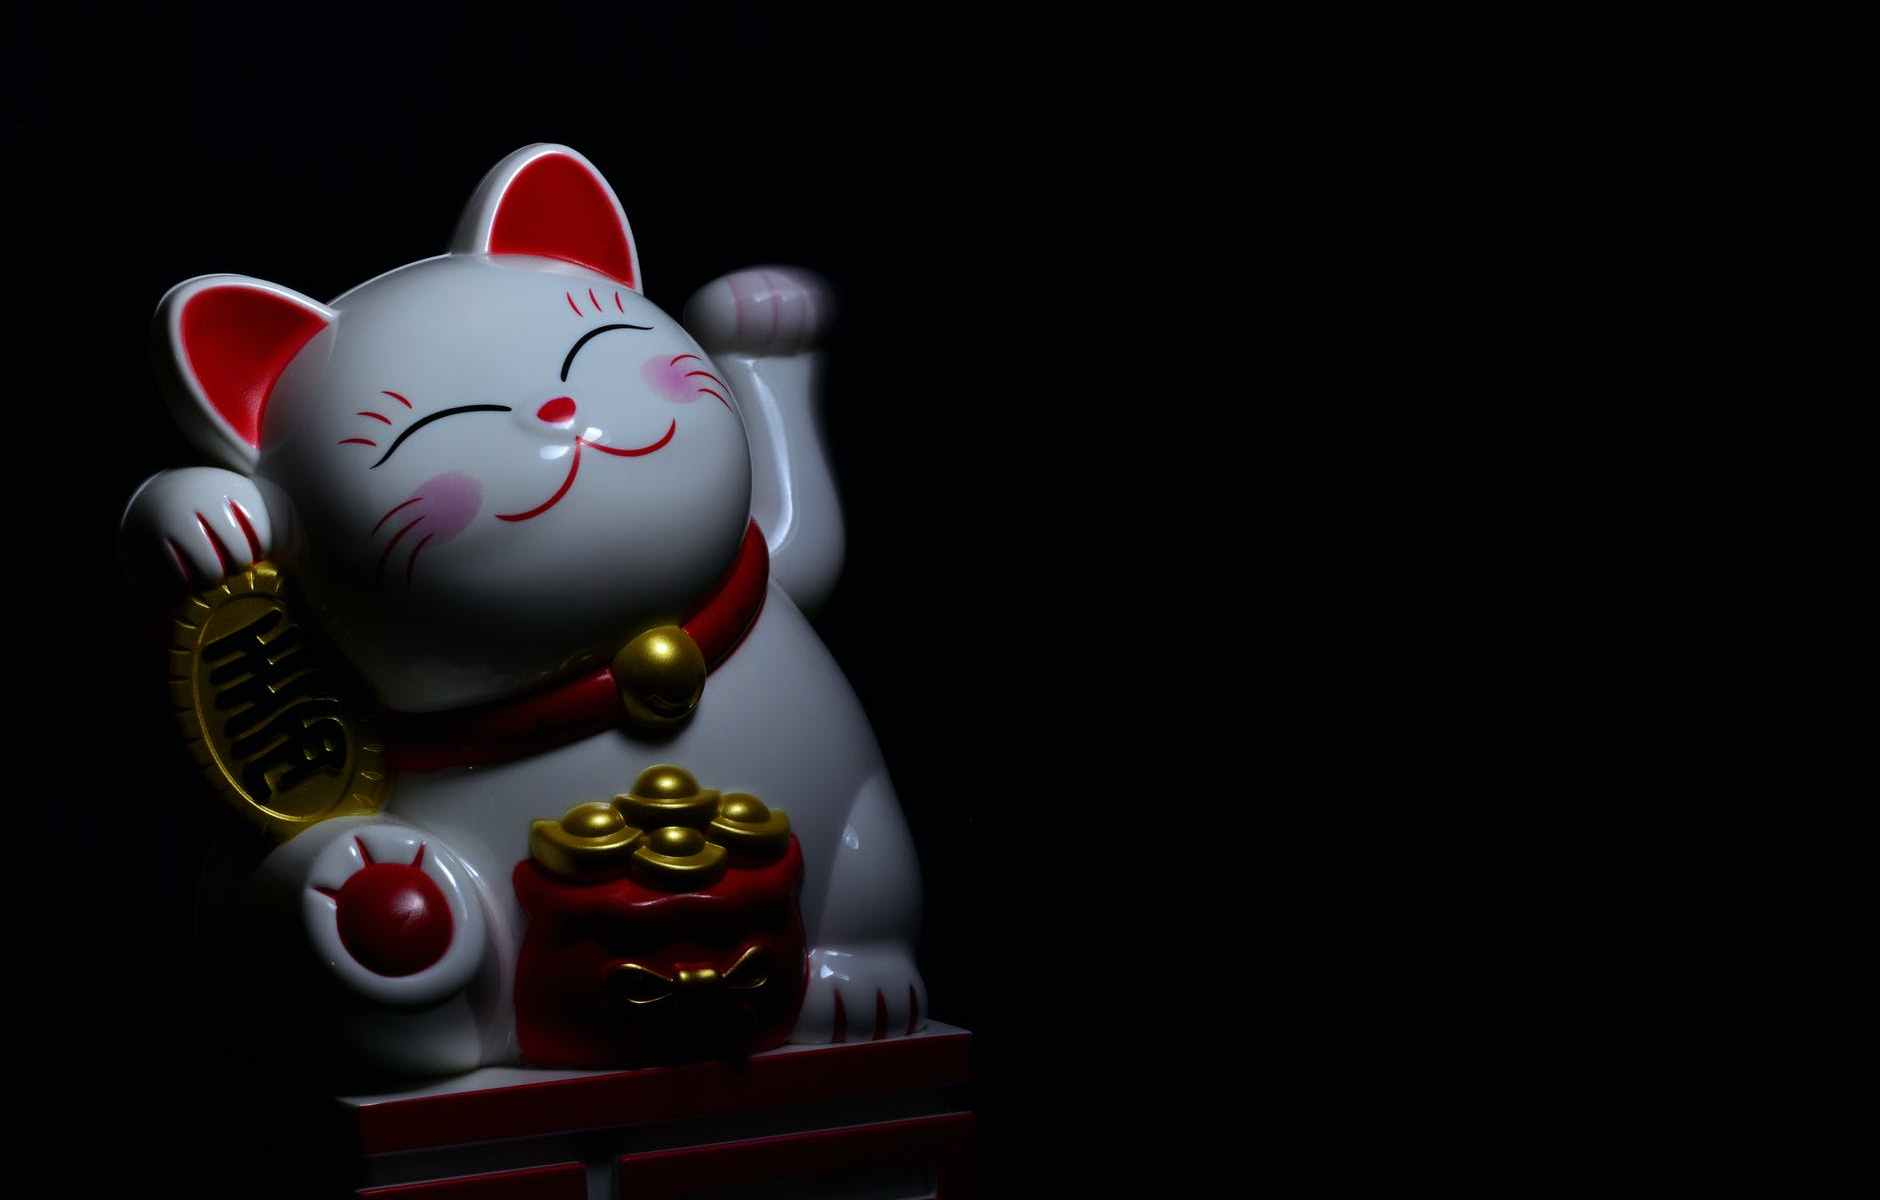 photo of maneki neko figurine